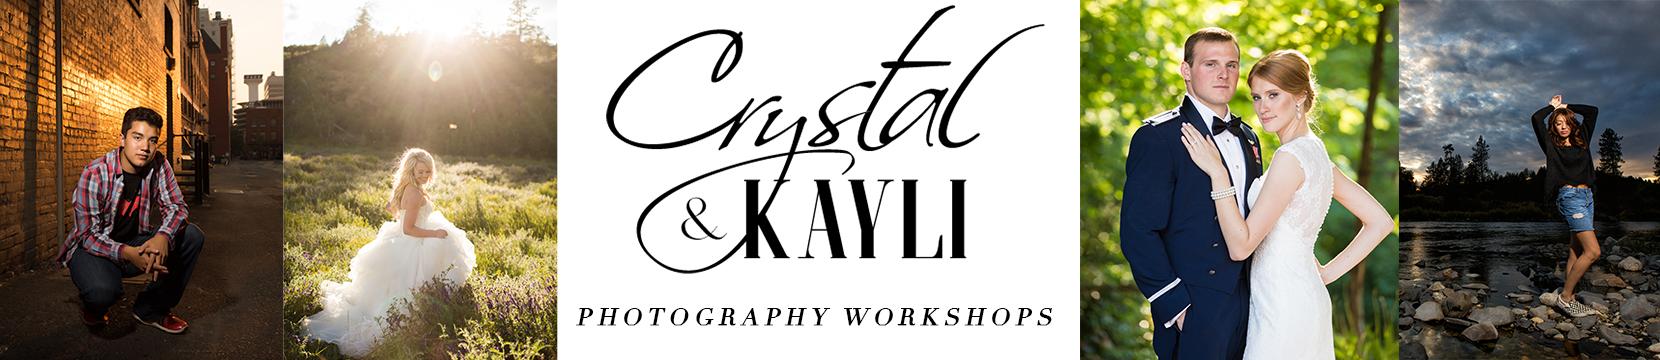 Crystal & Kayli Photography Workshops